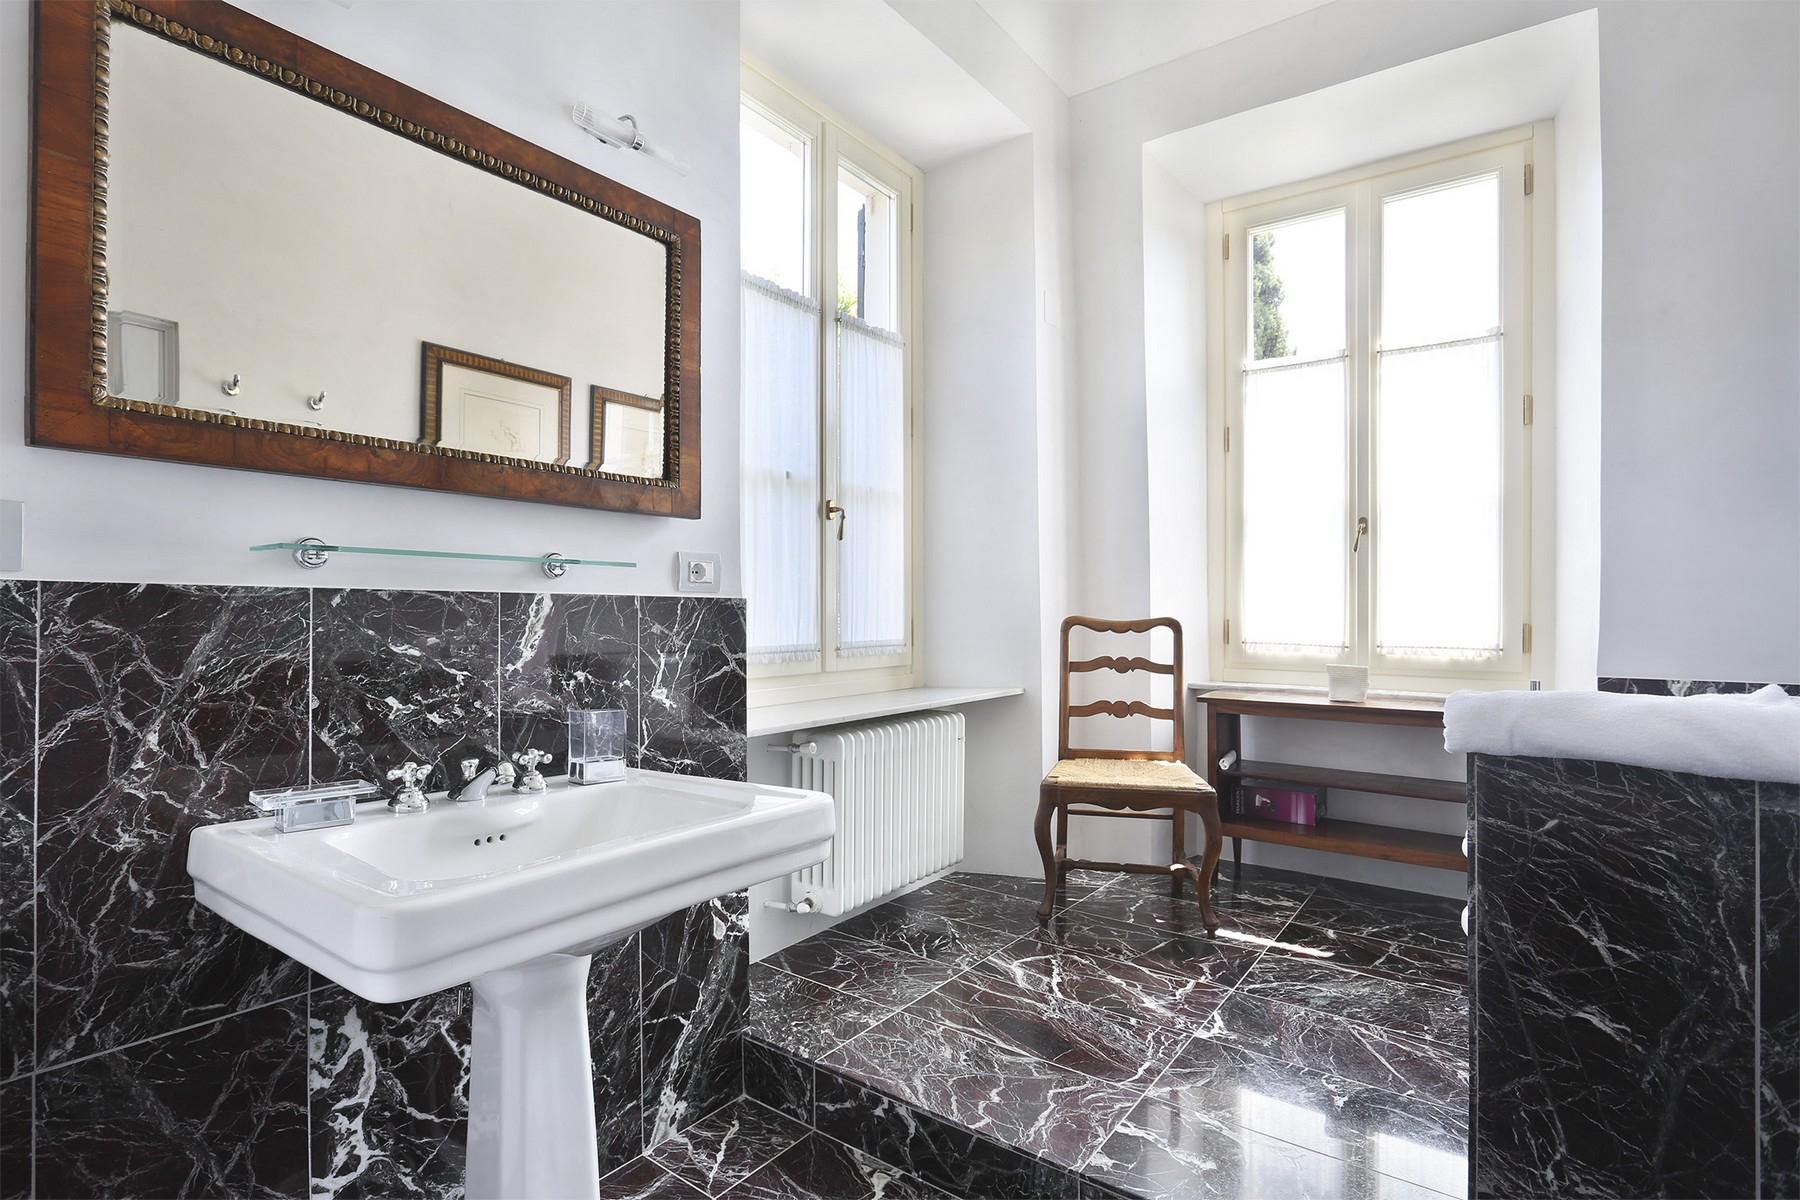 Villa in Vendita a Lucca: 5 locali, 735 mq - Foto 23